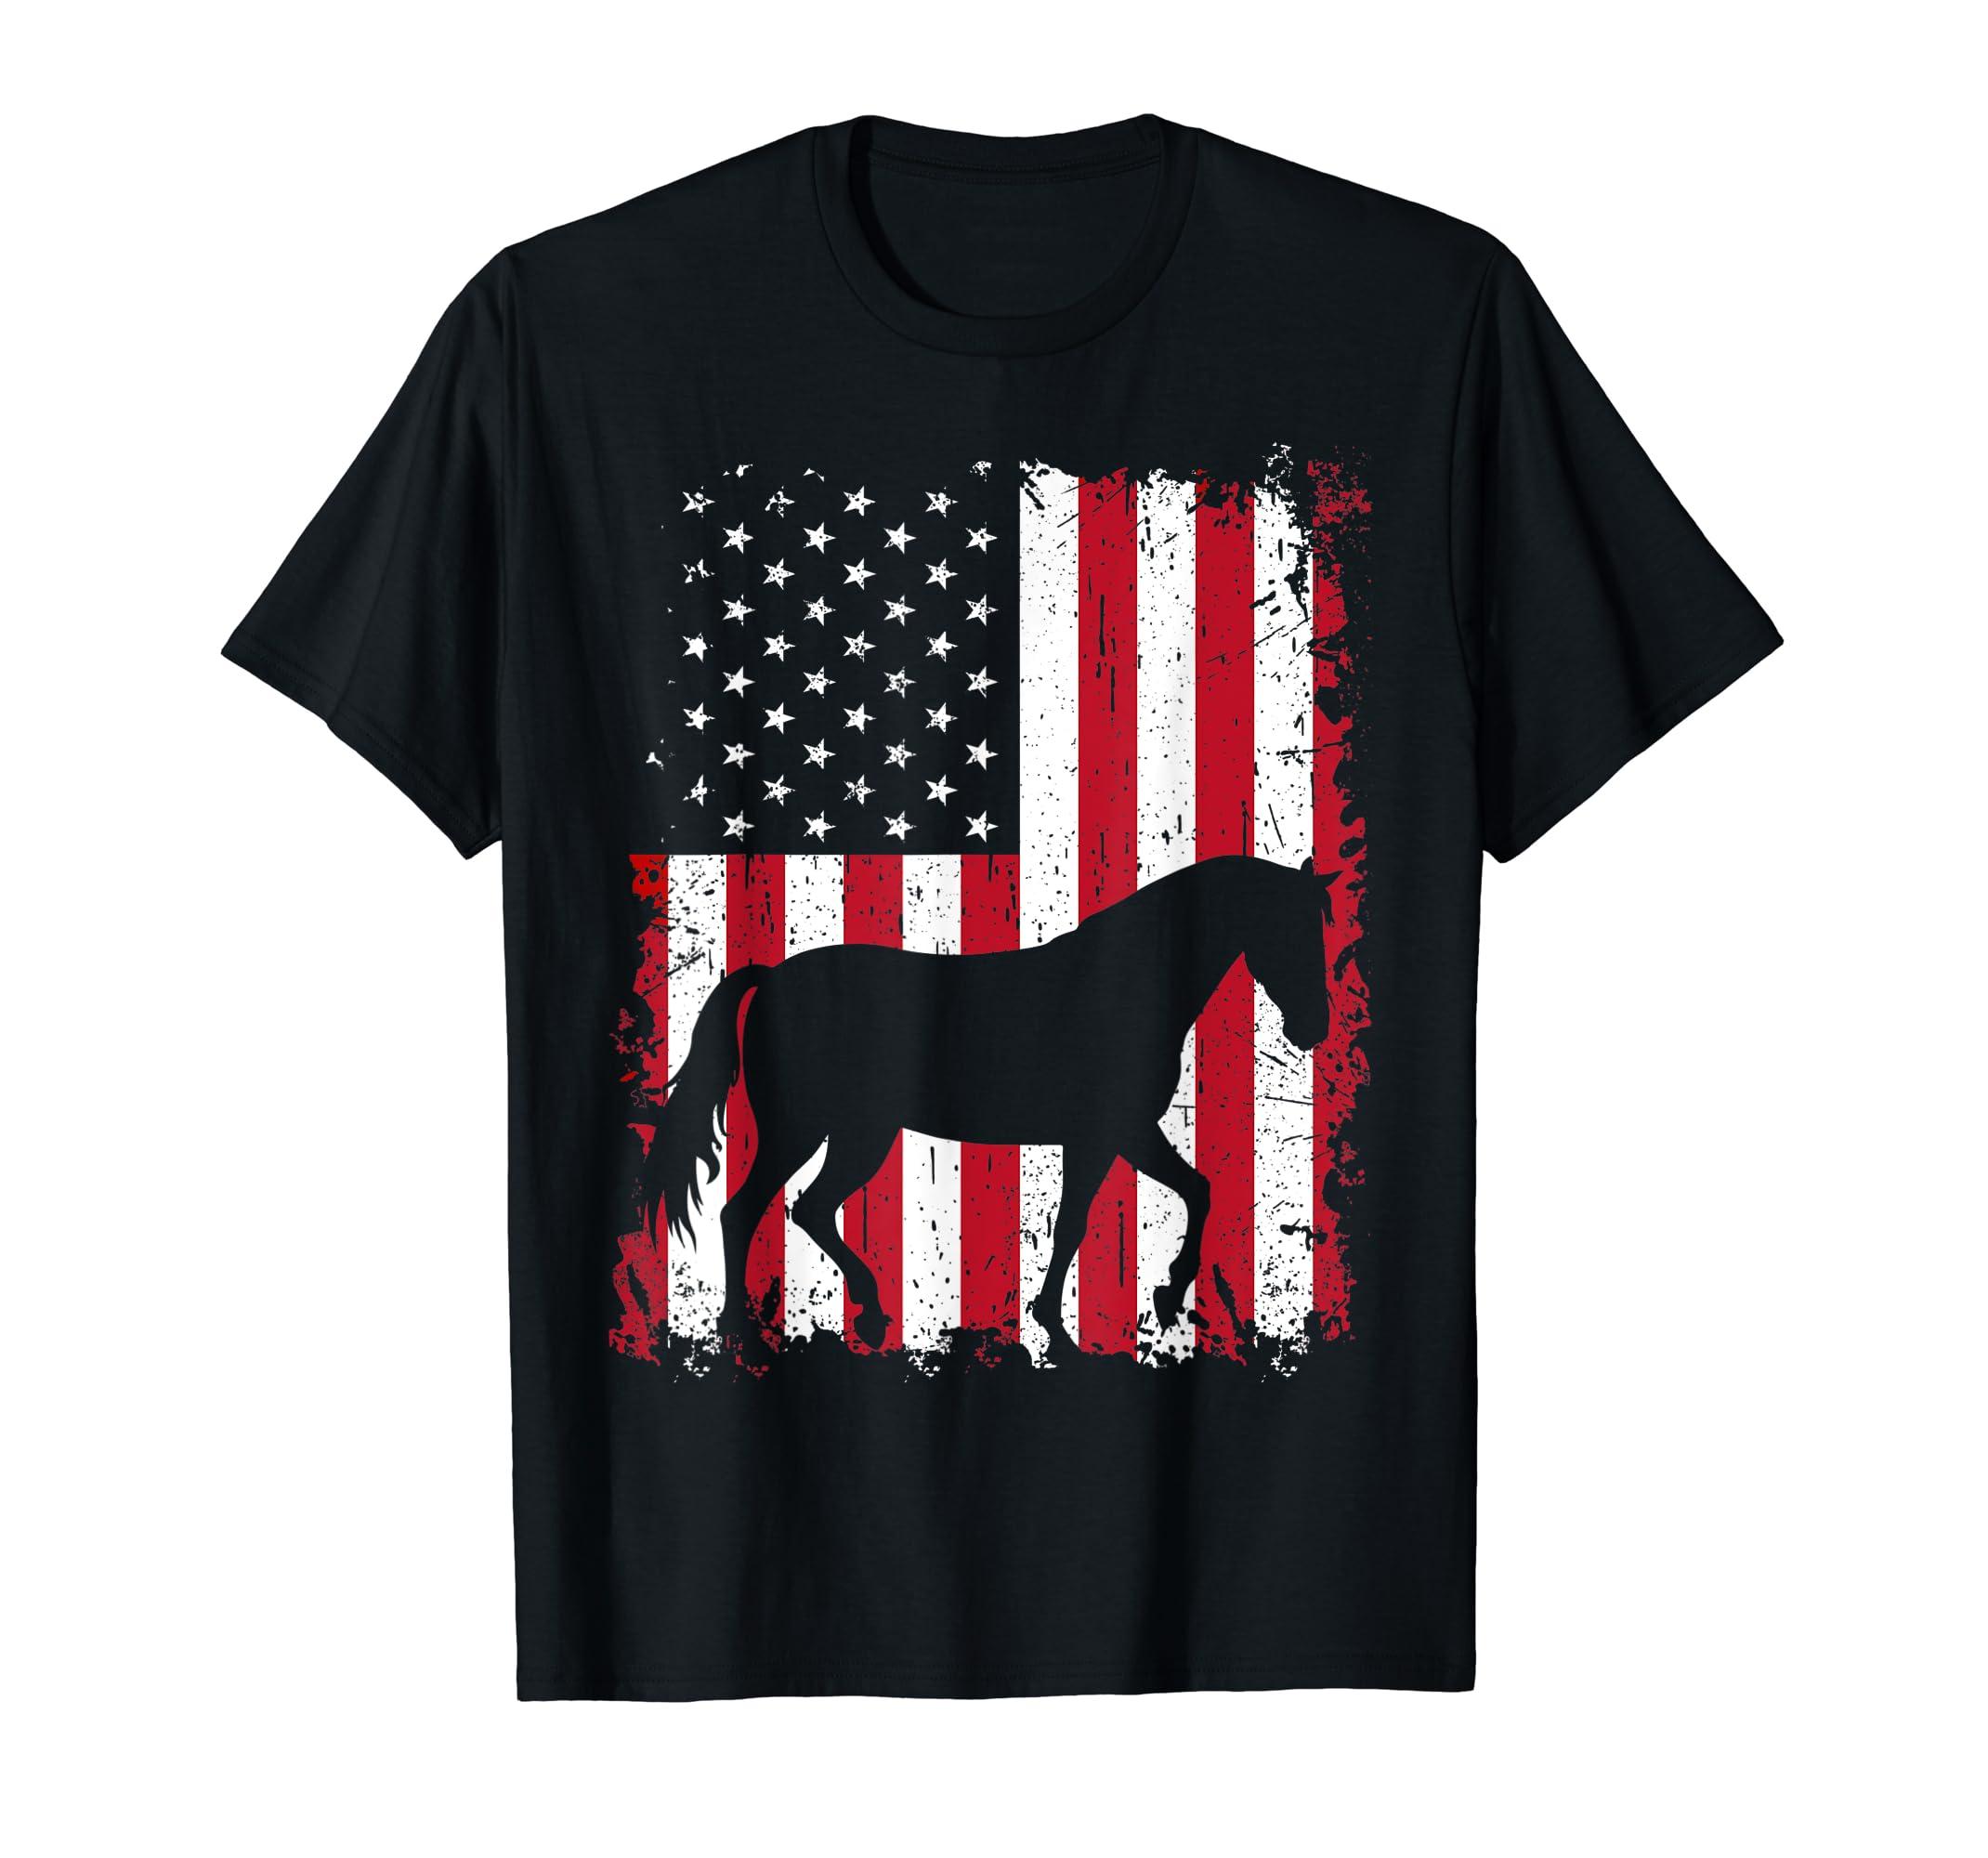 Horse 4th of July Shirt American USA Flag Patriotic Gift Tee-Men's T-Shirt-Black